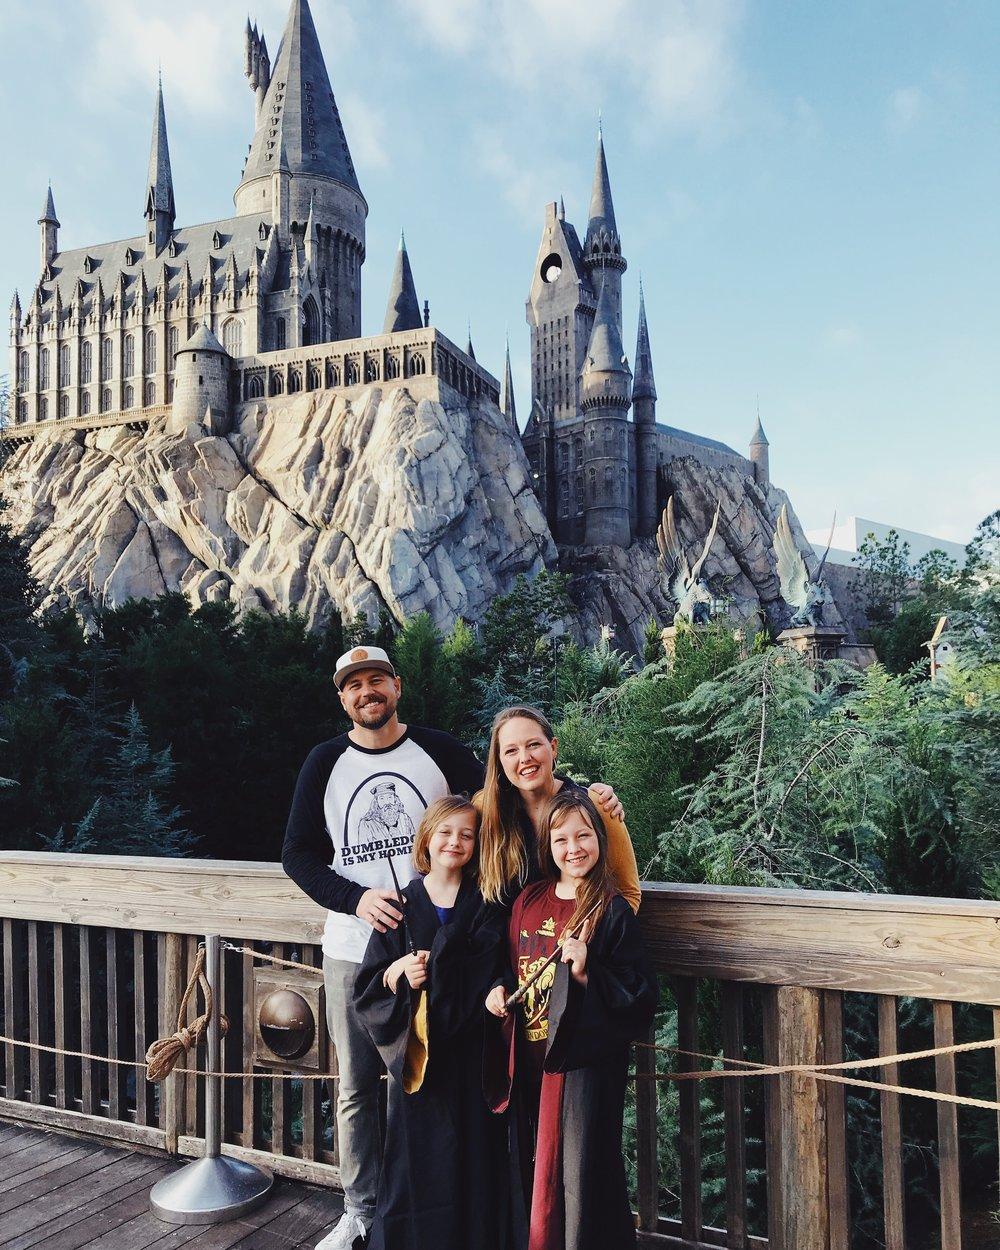 Harry Potter trip!